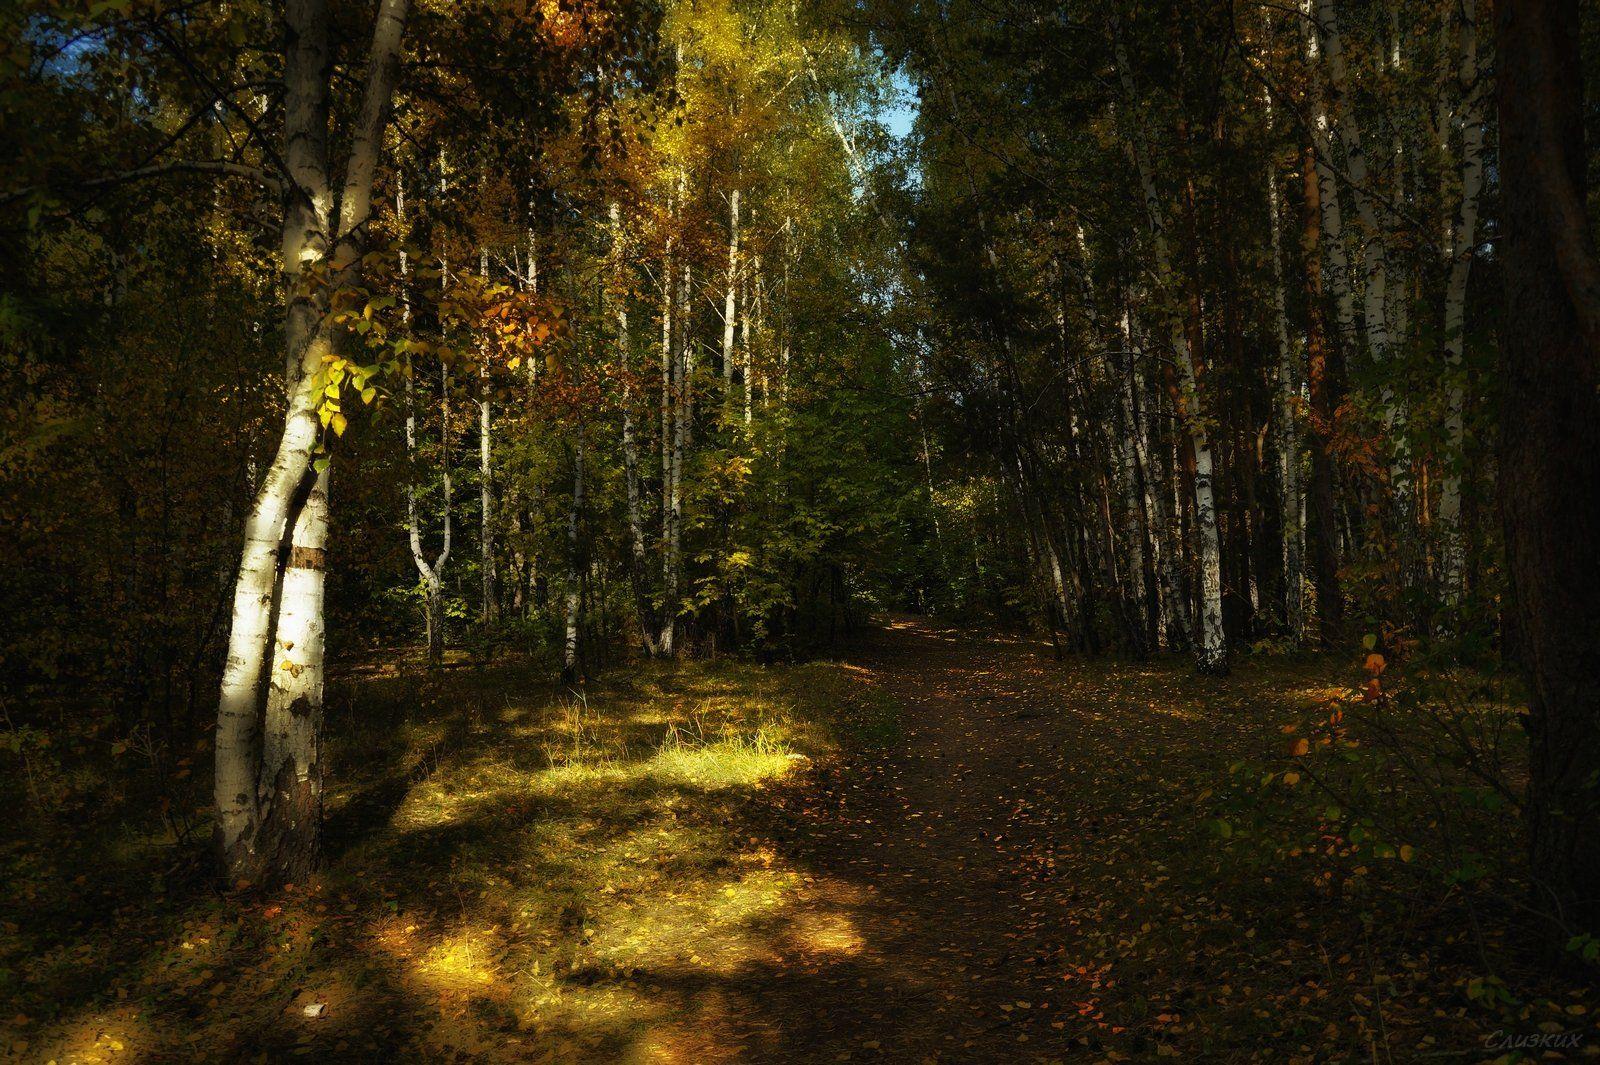 пейзаж,лес,тропинка,лес,берёза,сентябрь, Валерия